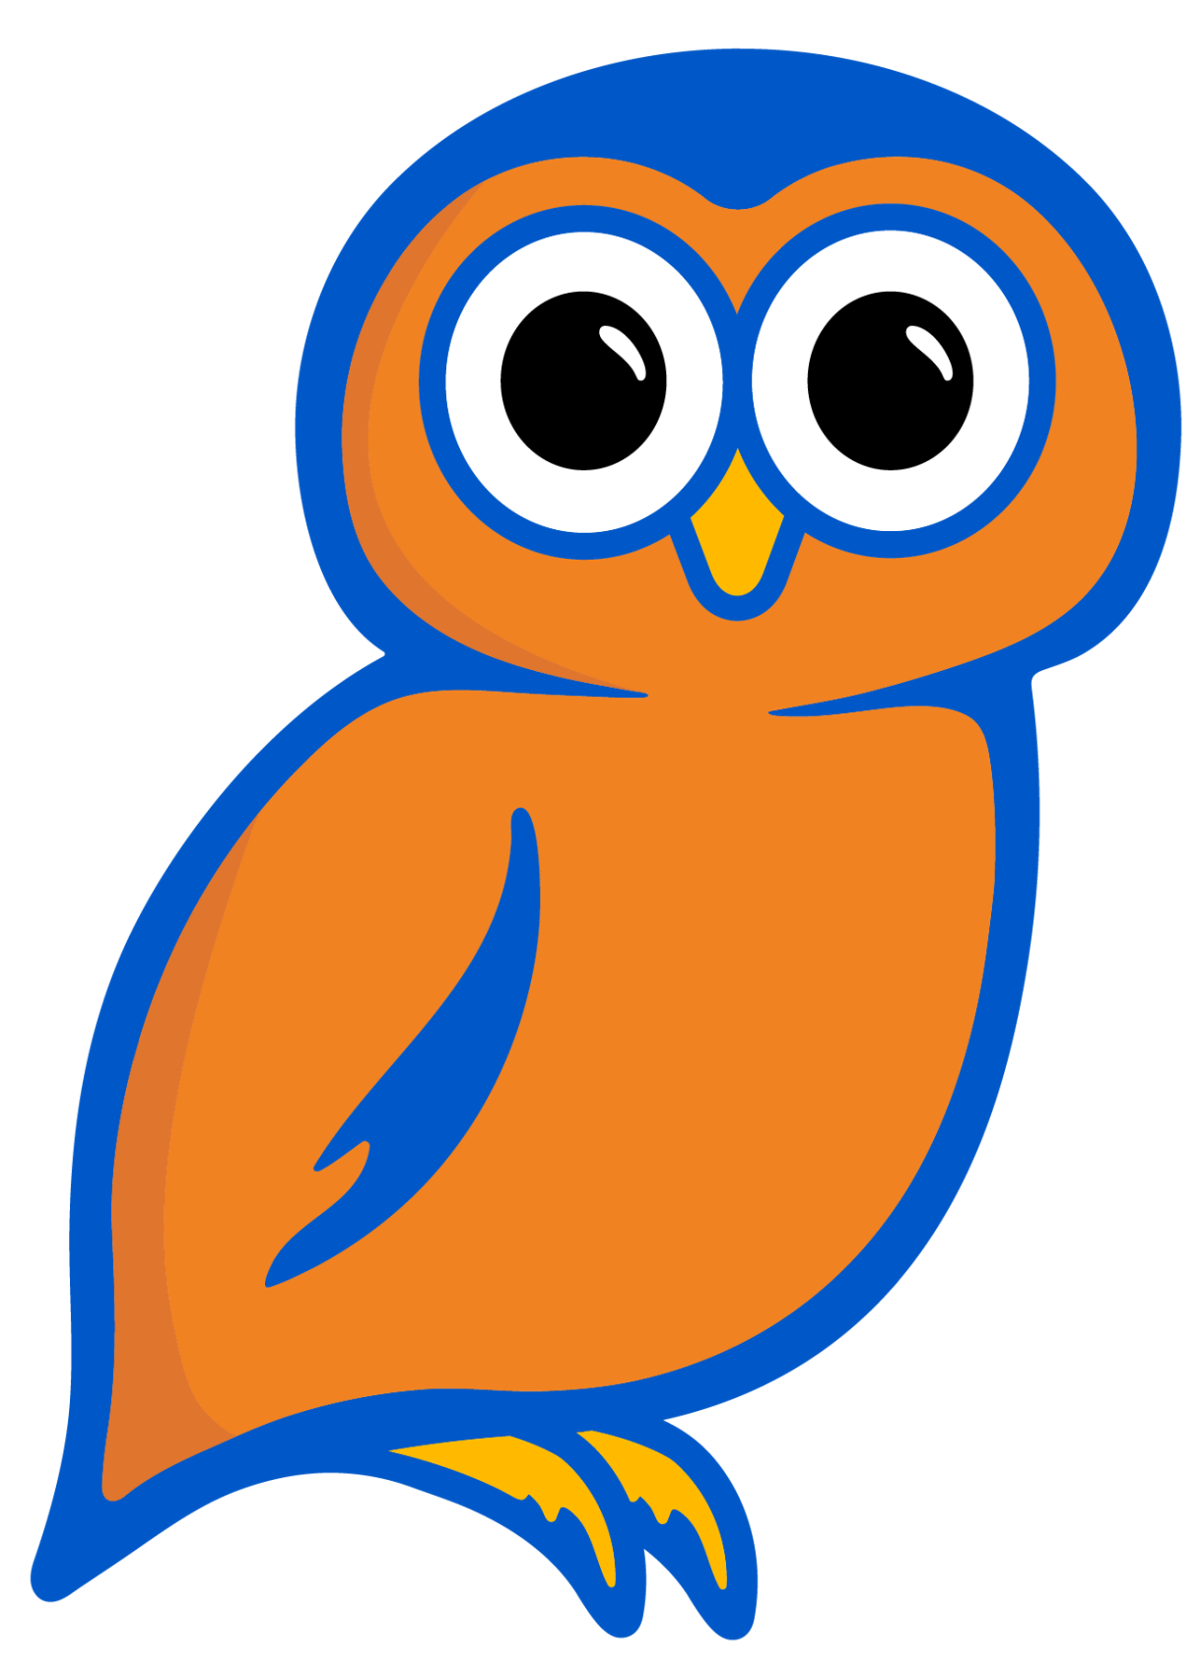 Travel plaza logo Onvo the owl